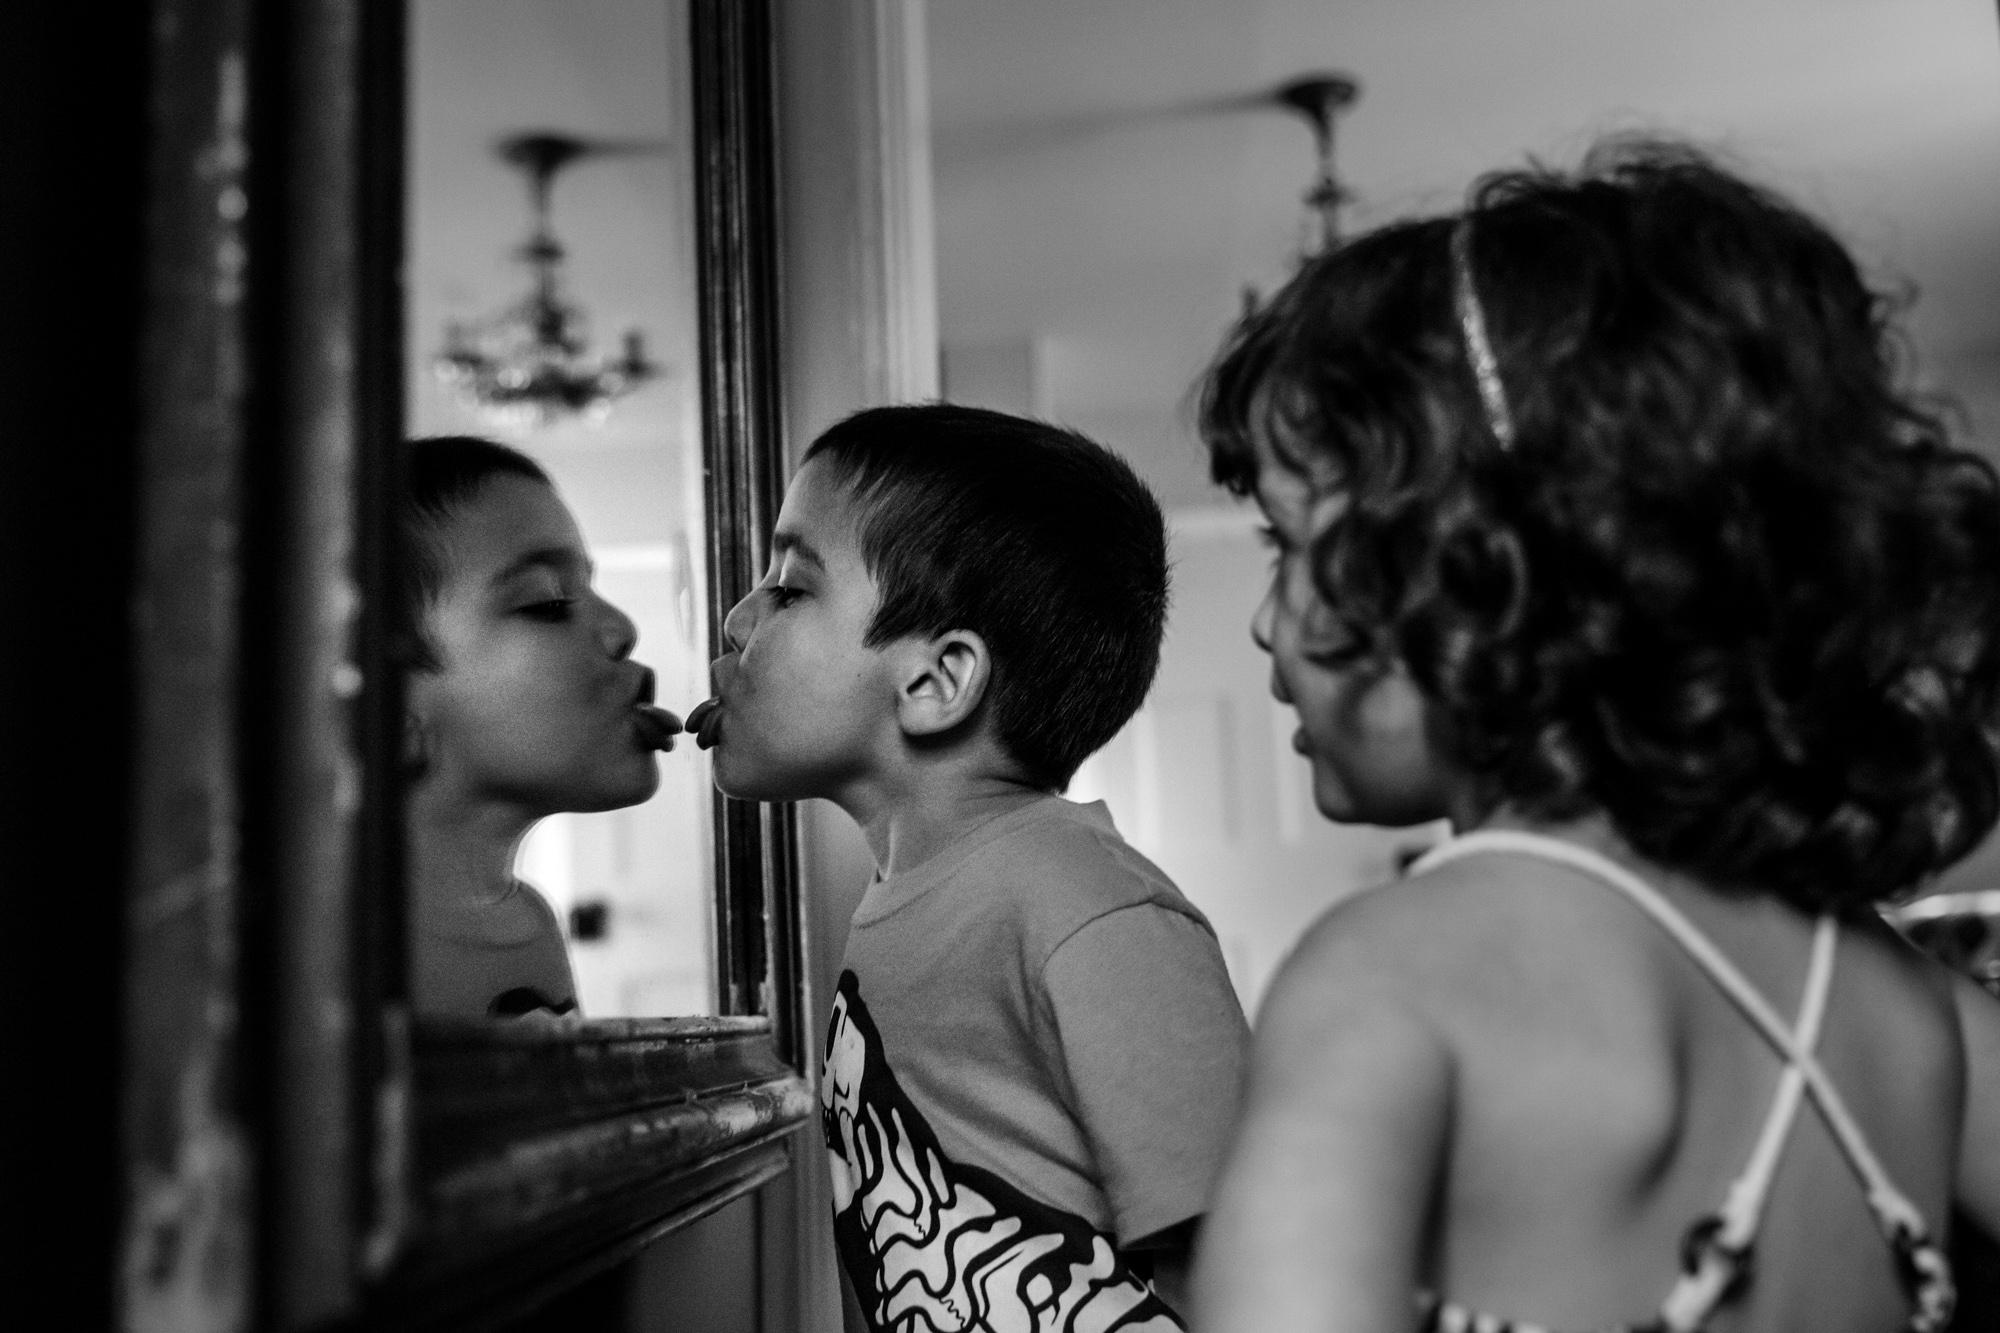 Boy licks mirror while girl watches